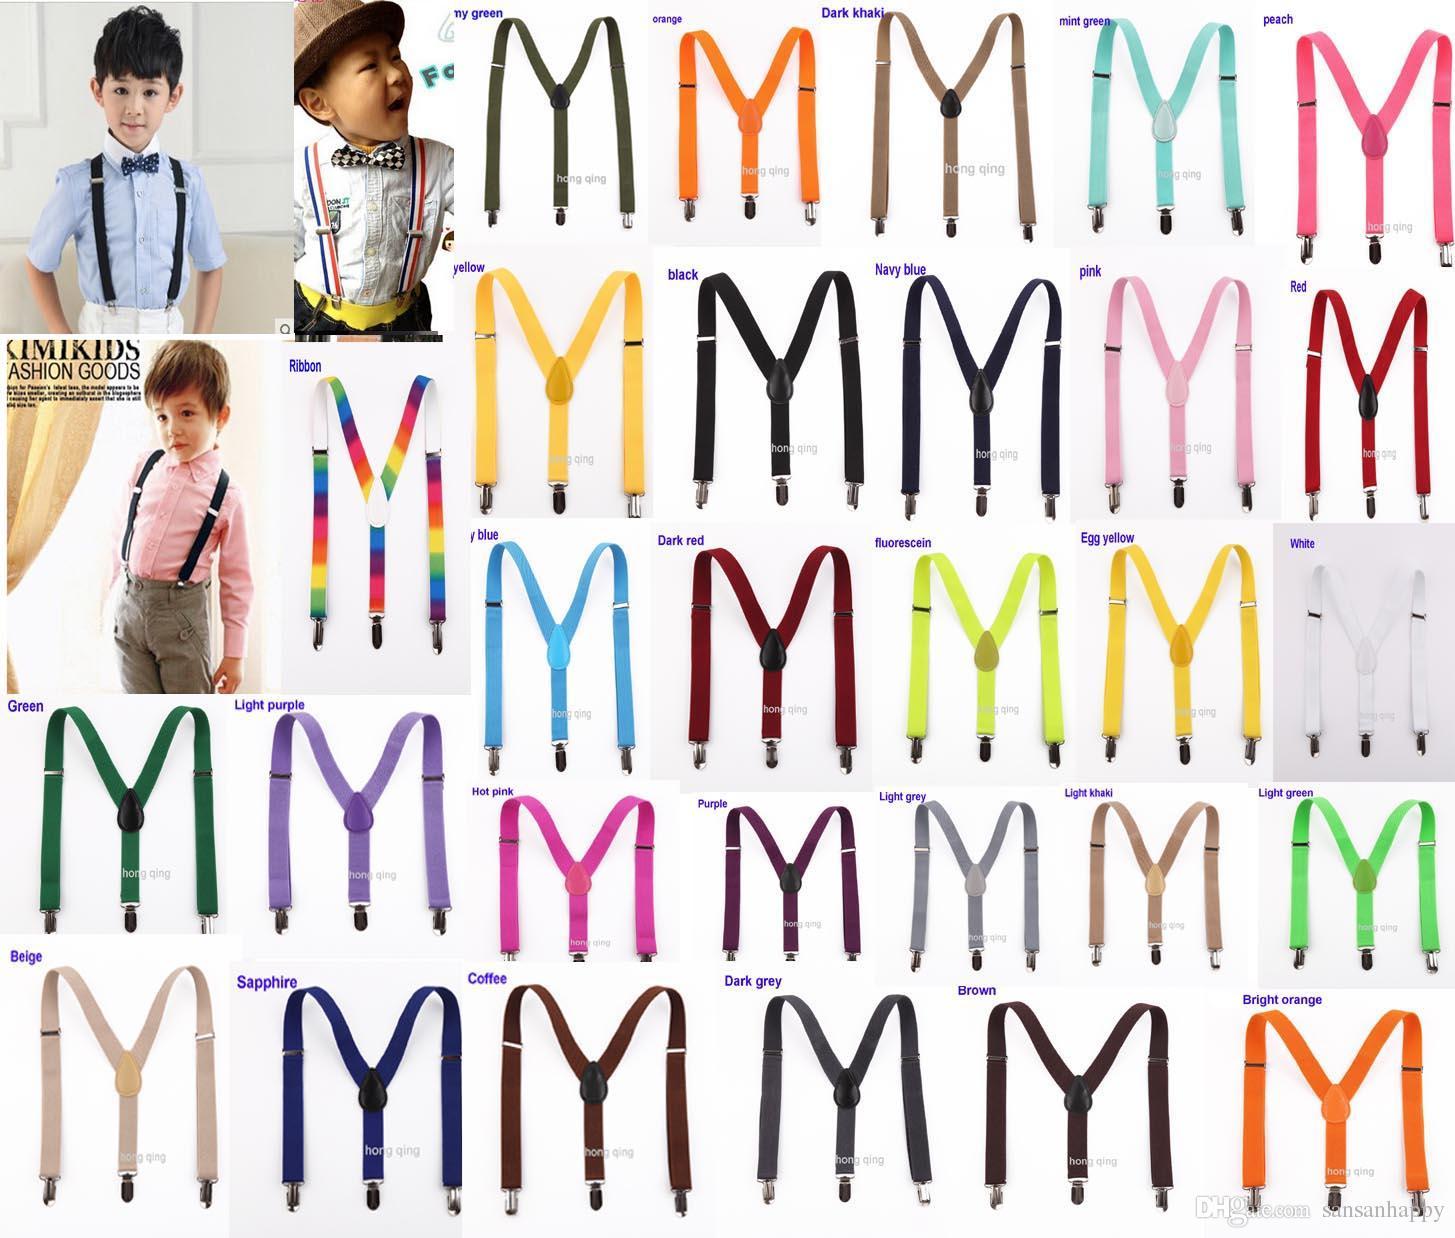 Niños Ropa de Liguero Niño Pantalones Casuales Pantalones Largos de Moda Tirantes Tirantes Pantalones de Niño Pantalones de Niños Ropa de Niños